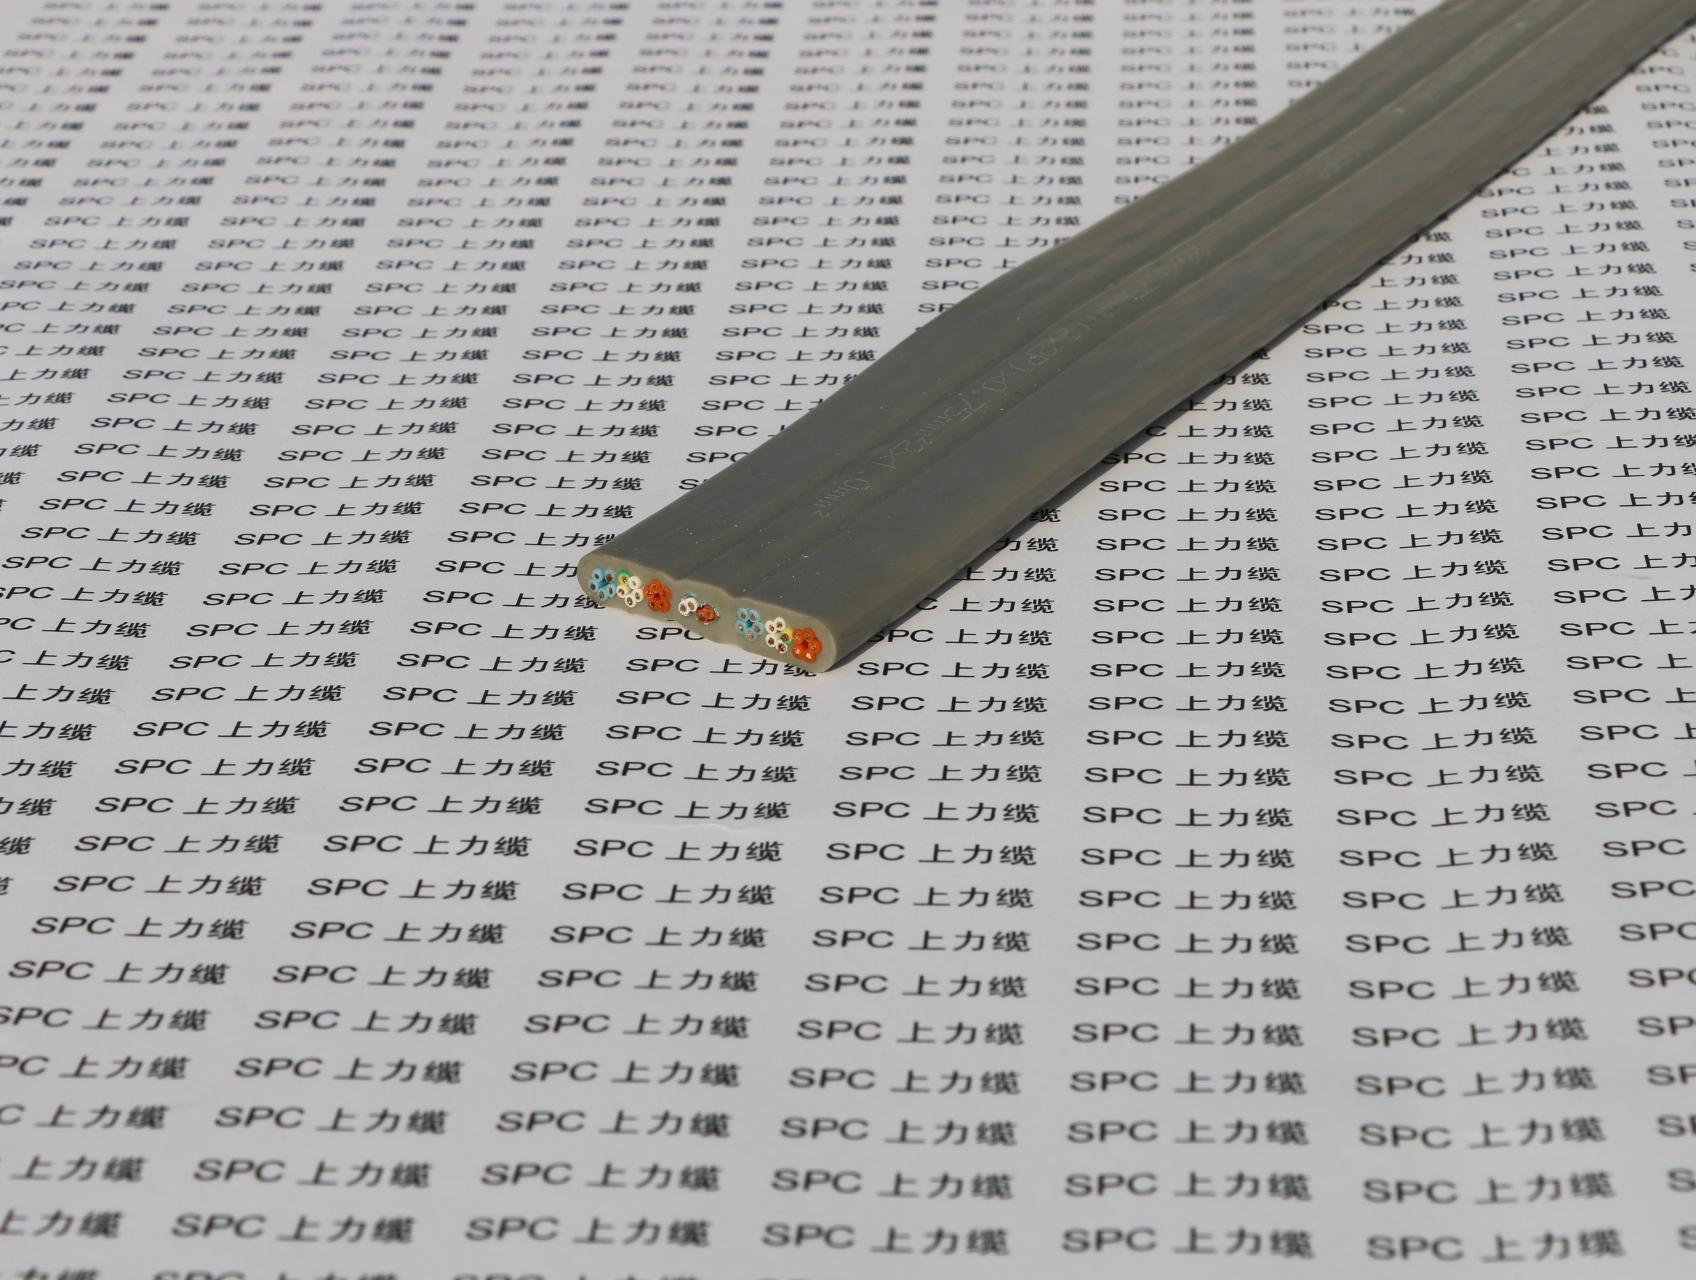 SPCFLAT-ELEVATOR-YY 电梯随行扁电缆TVVB 电梯随行扁电缆TVVBPG带钢丝